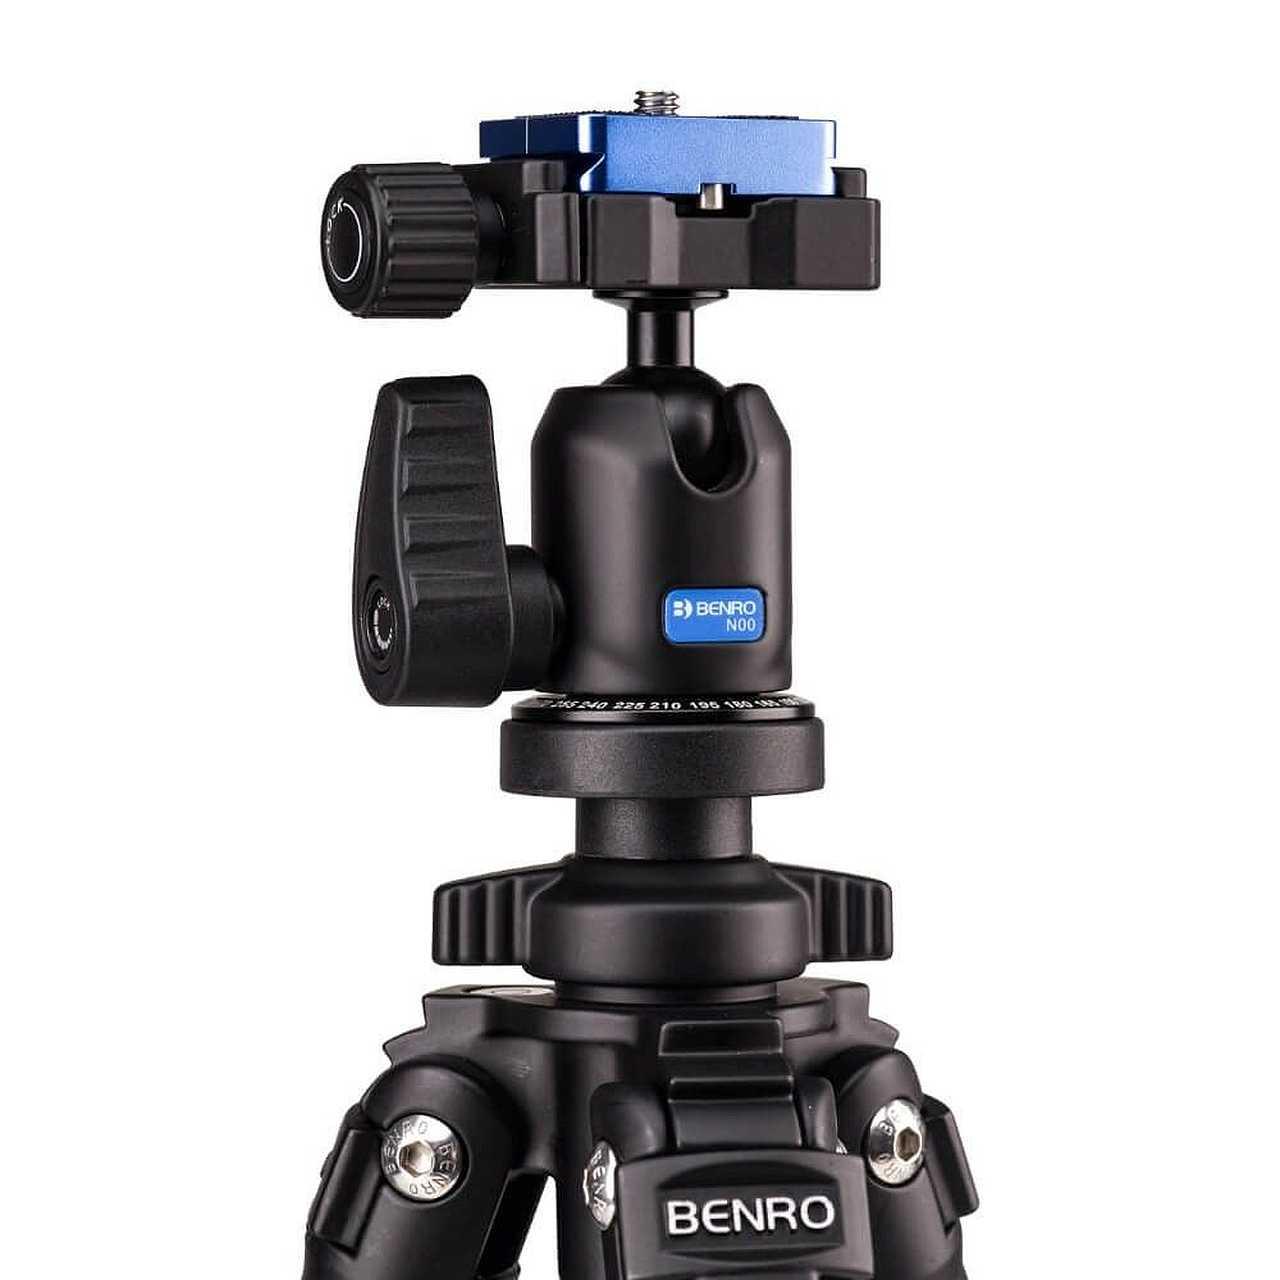 Benro-TSL08CN00 head